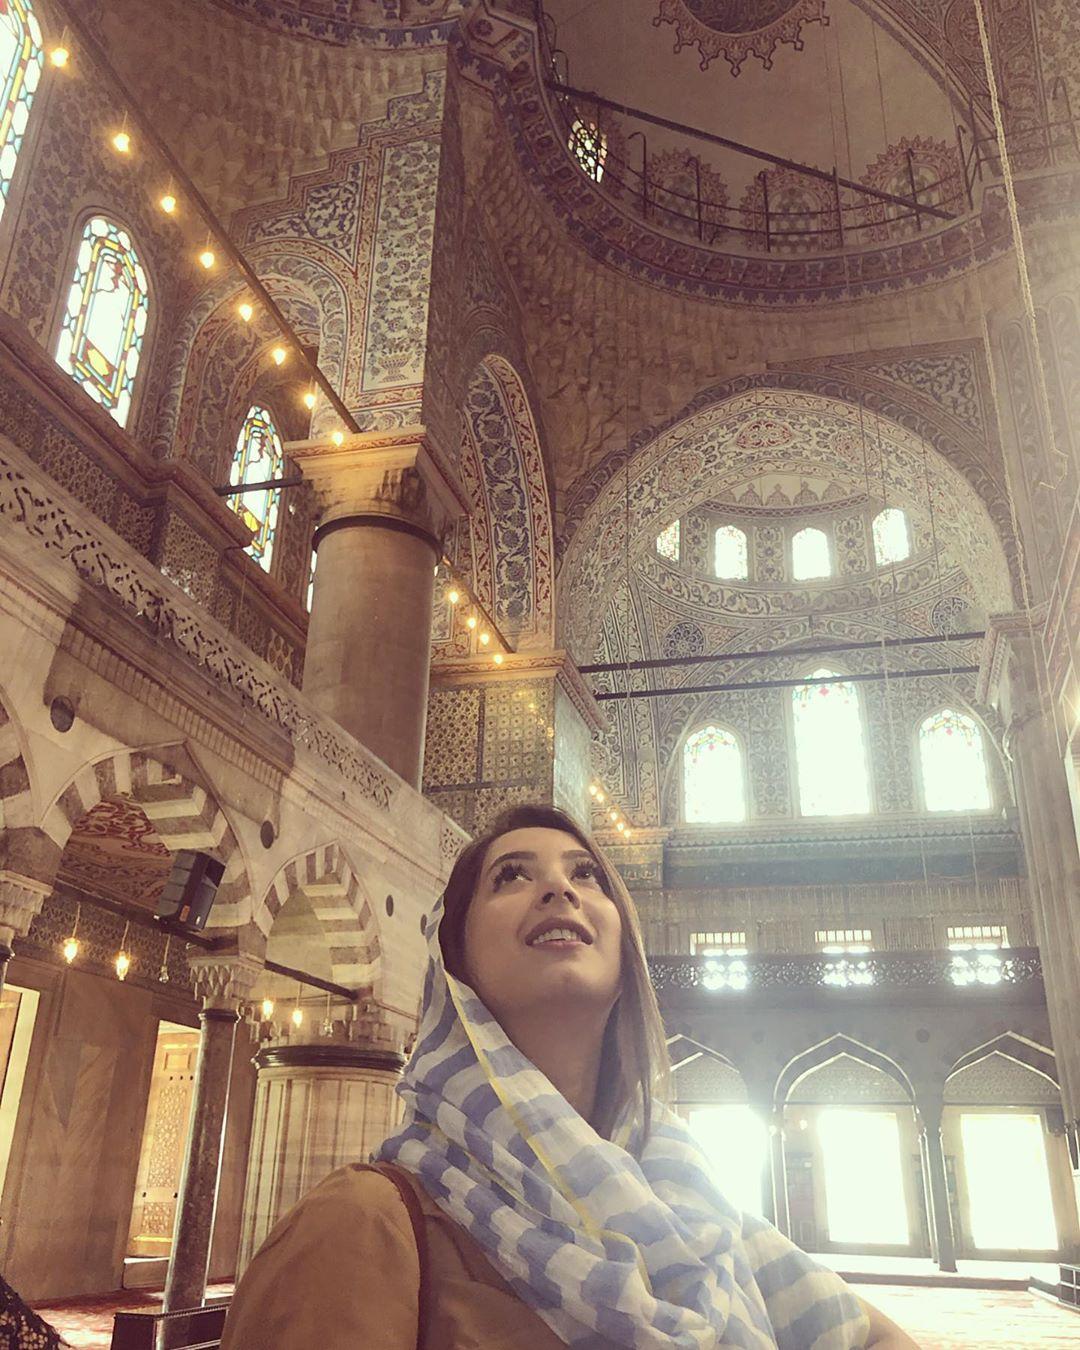 Actress Komal Aziz Having Leisure Time Spotted in Turkey